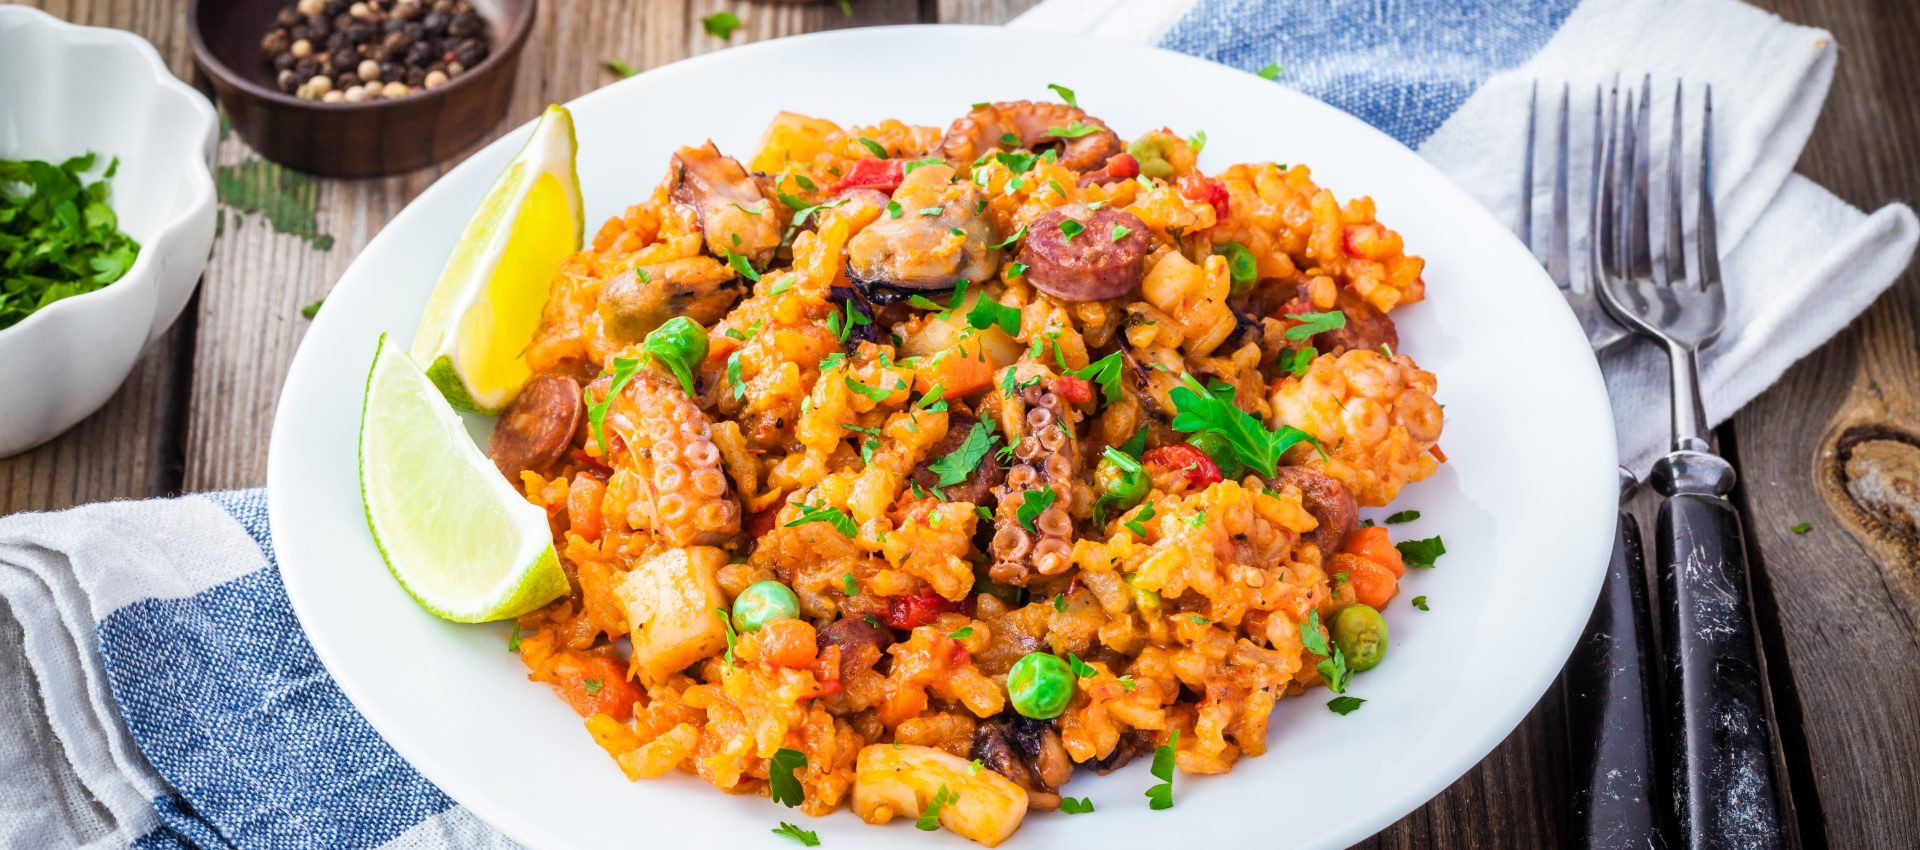 Paella gourmande ww au cookeo